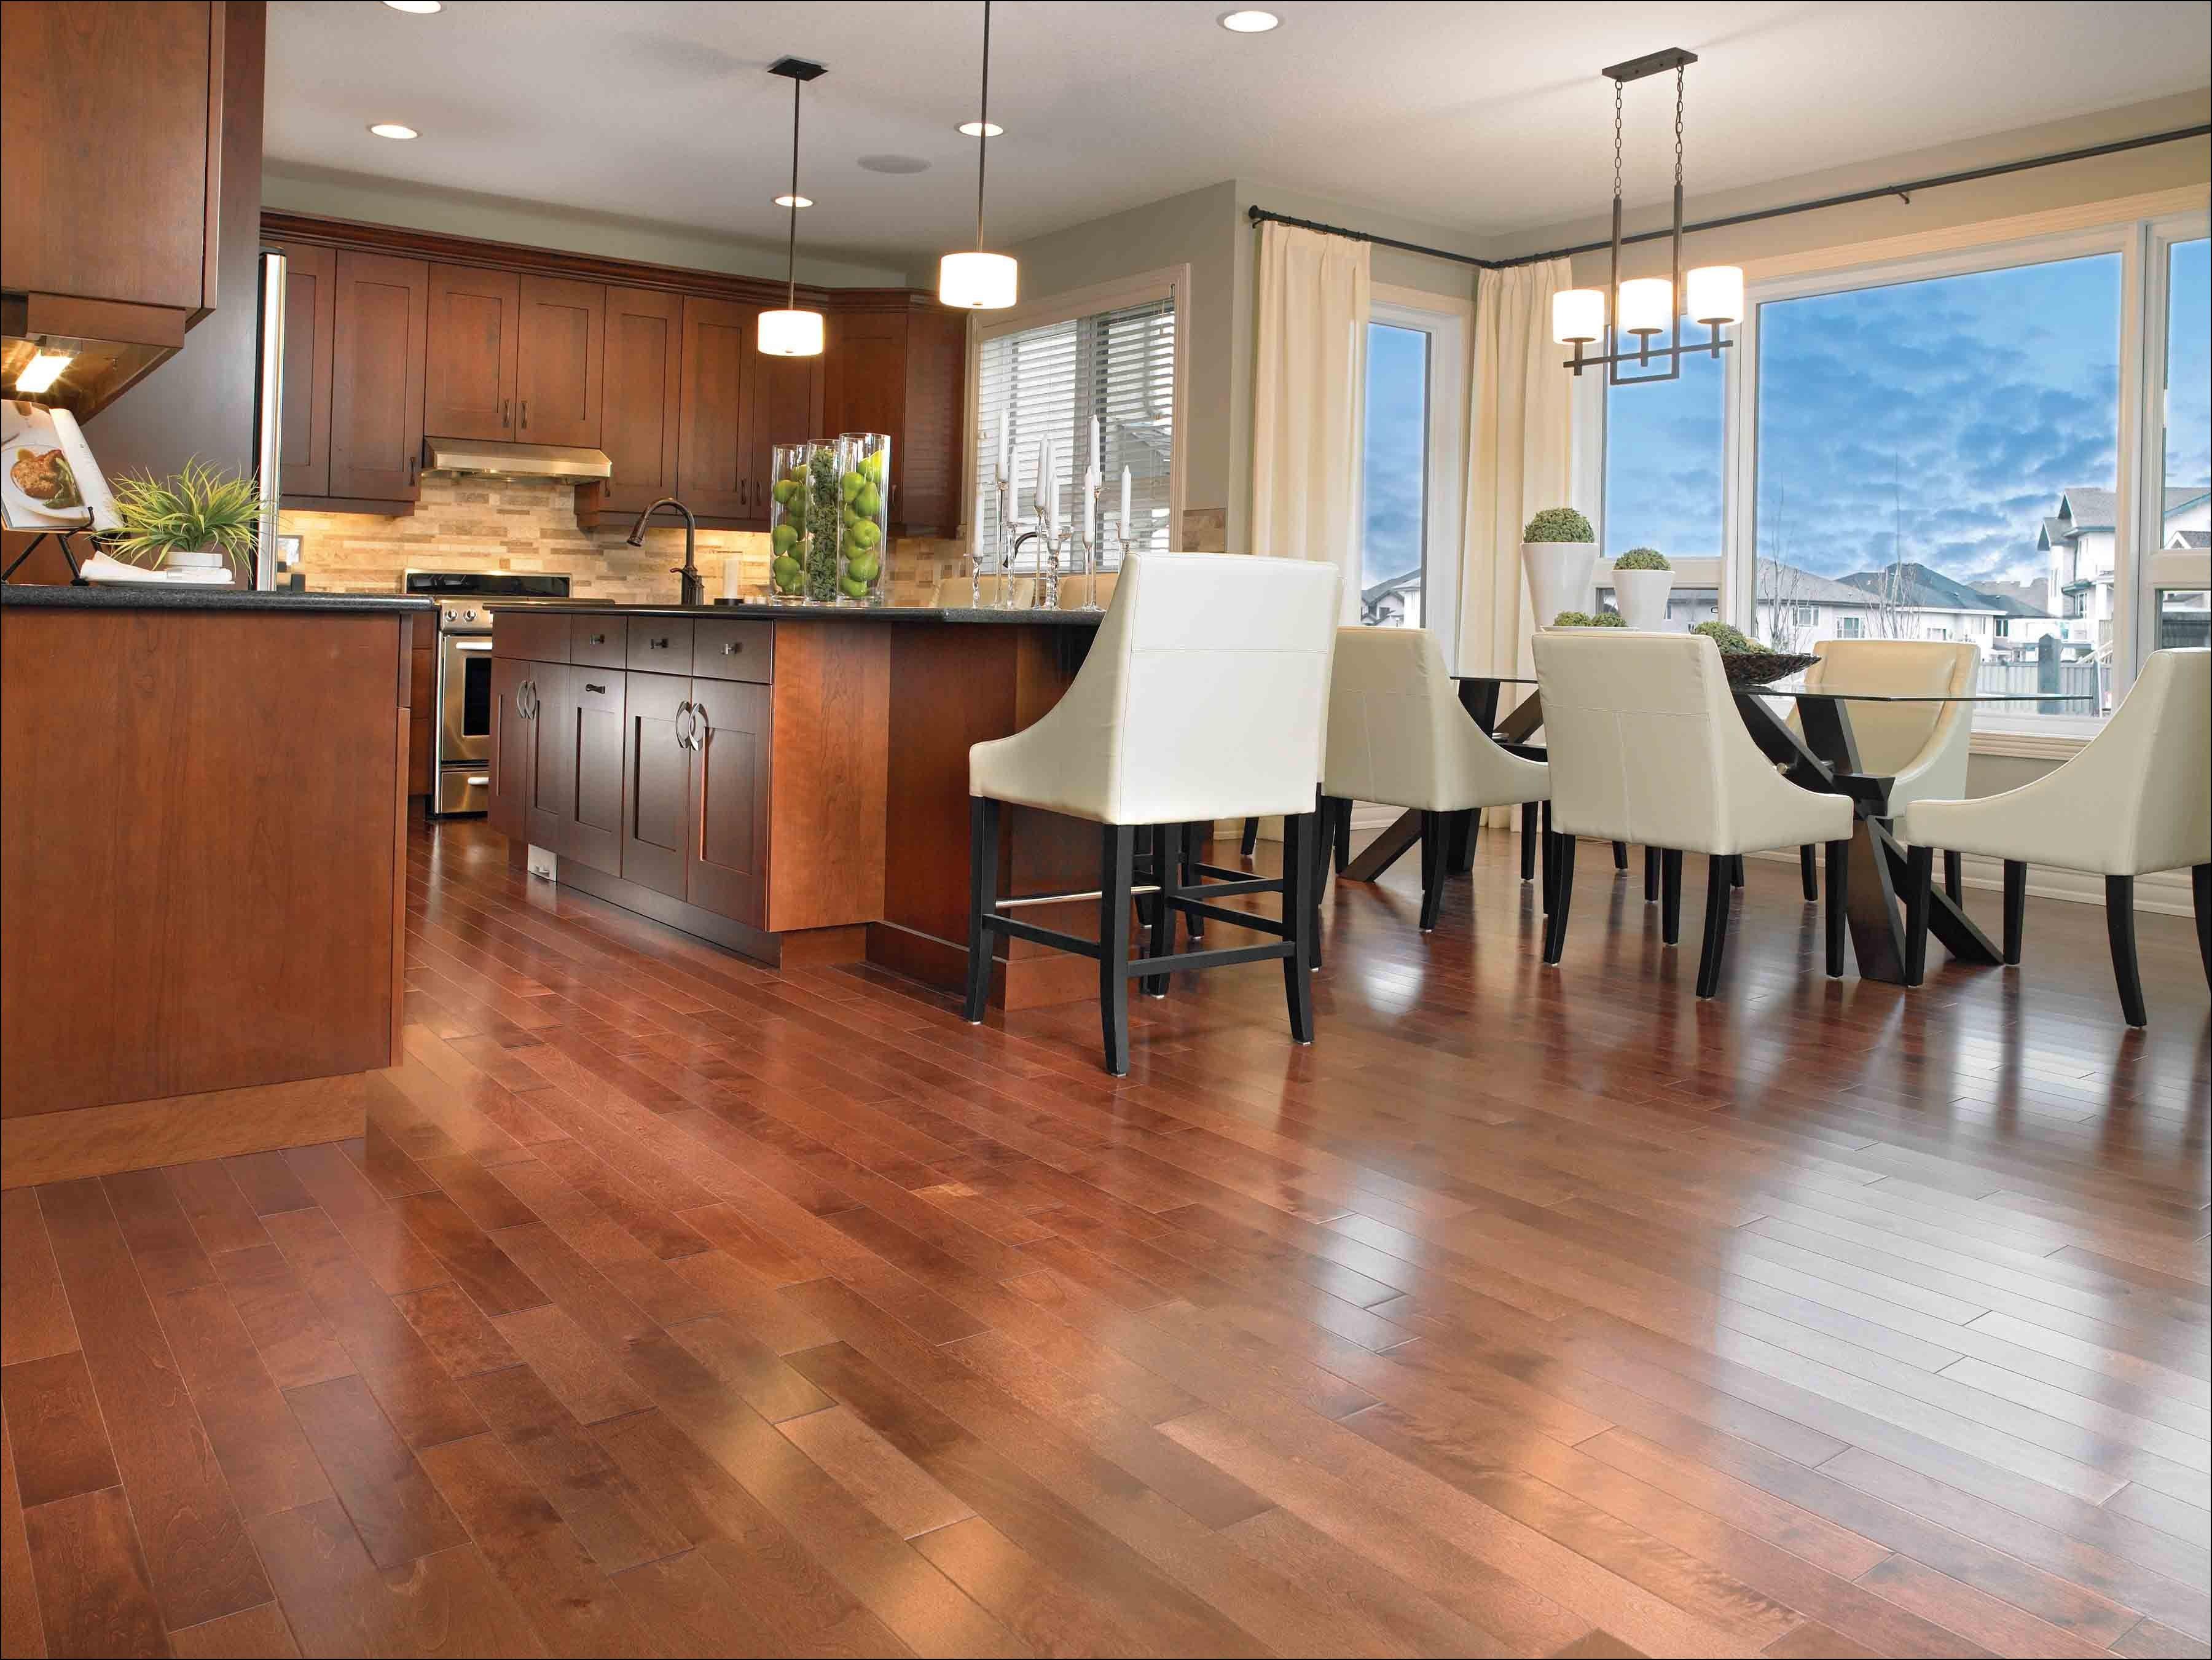 21 Cute Wide Plank Vs Narrow Plank Hardwood Flooring